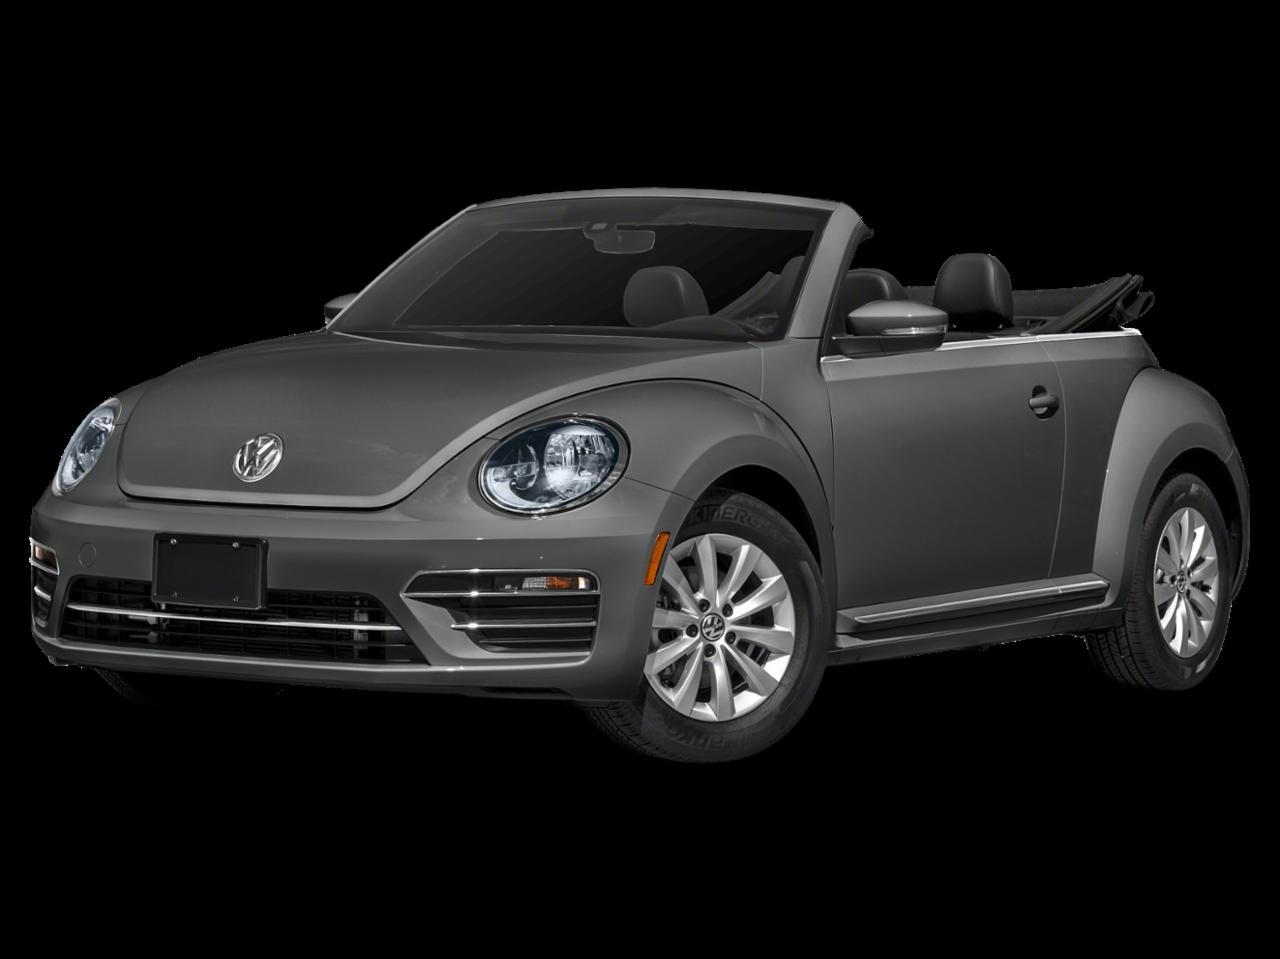 Volkswagen 2019 Beetle Convertible Final Edition SEL